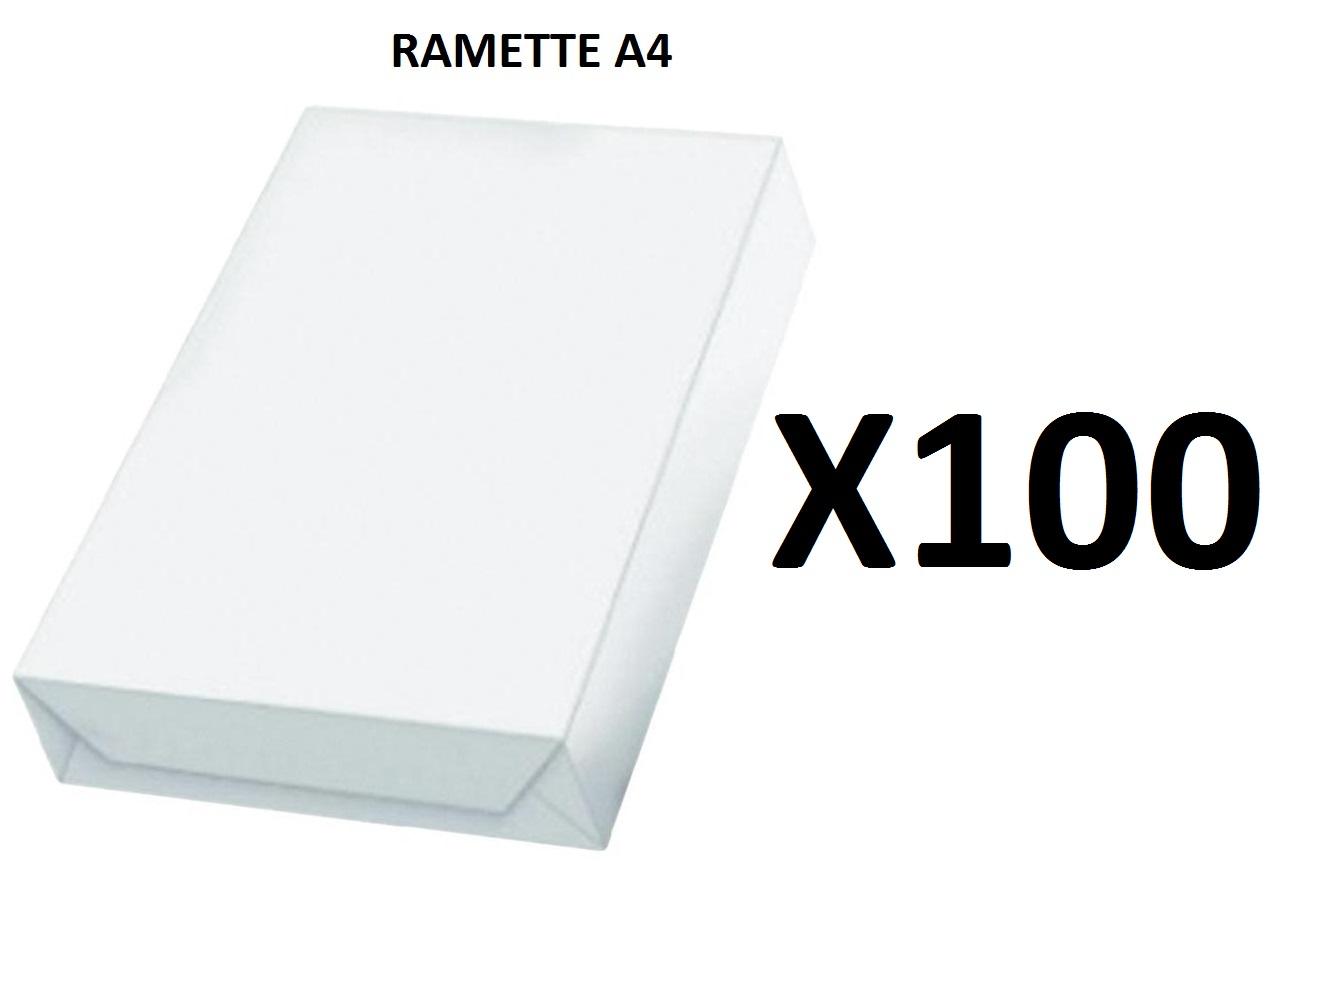 Ramette Papier A4 - 80Grs - Blanc - 500 Feuilles - X100